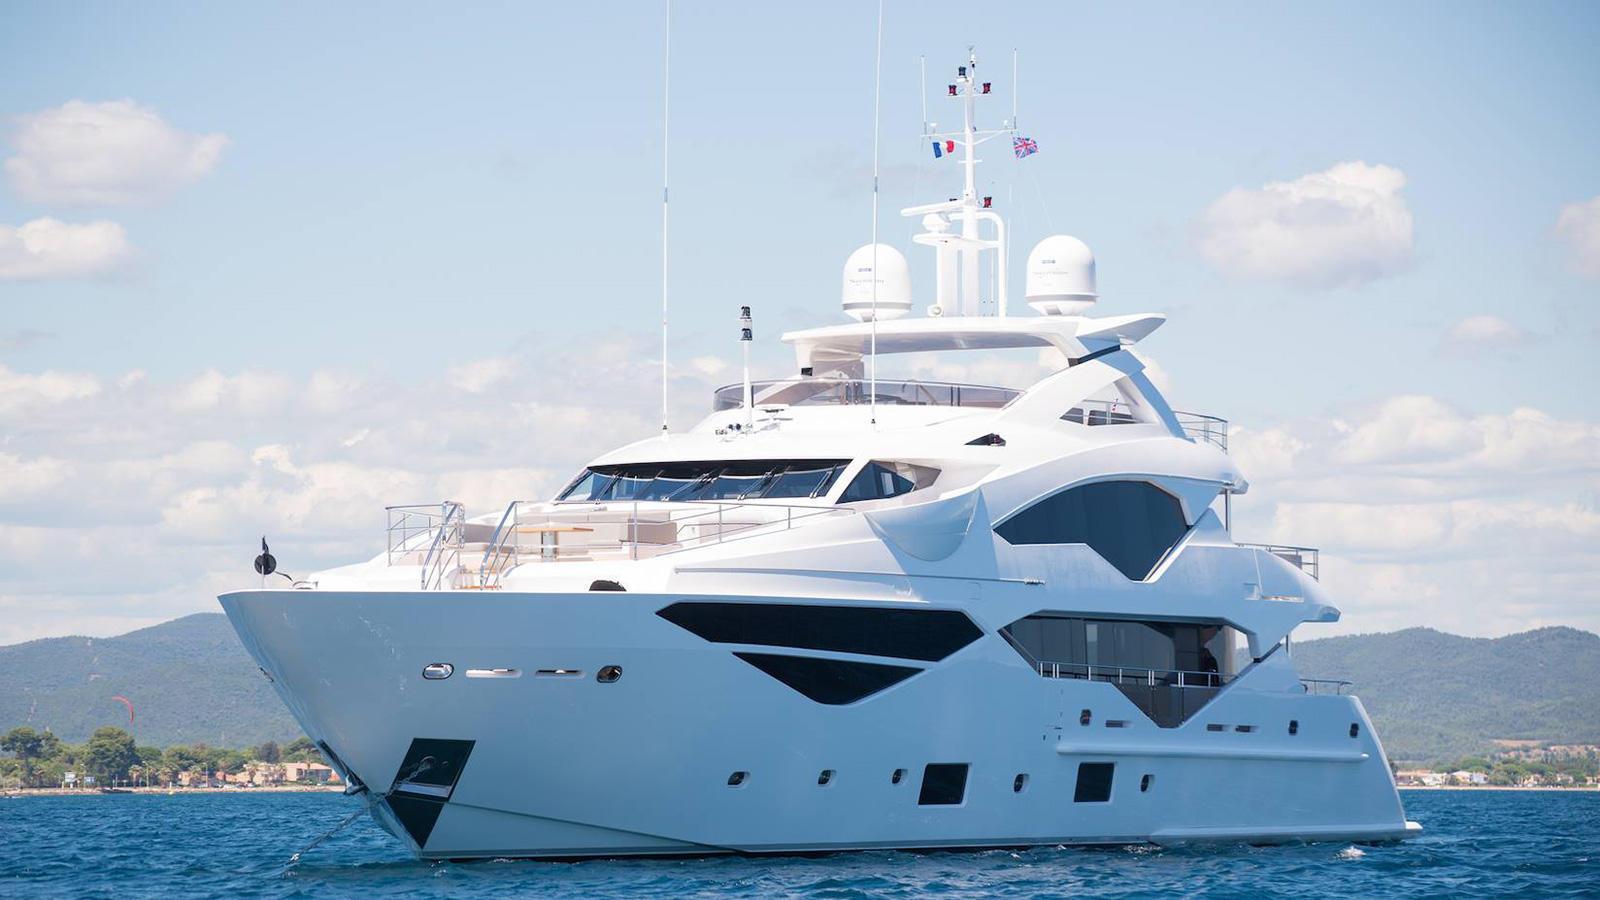 jacozami motoryacht sunseeker 131 2016 40m half profile